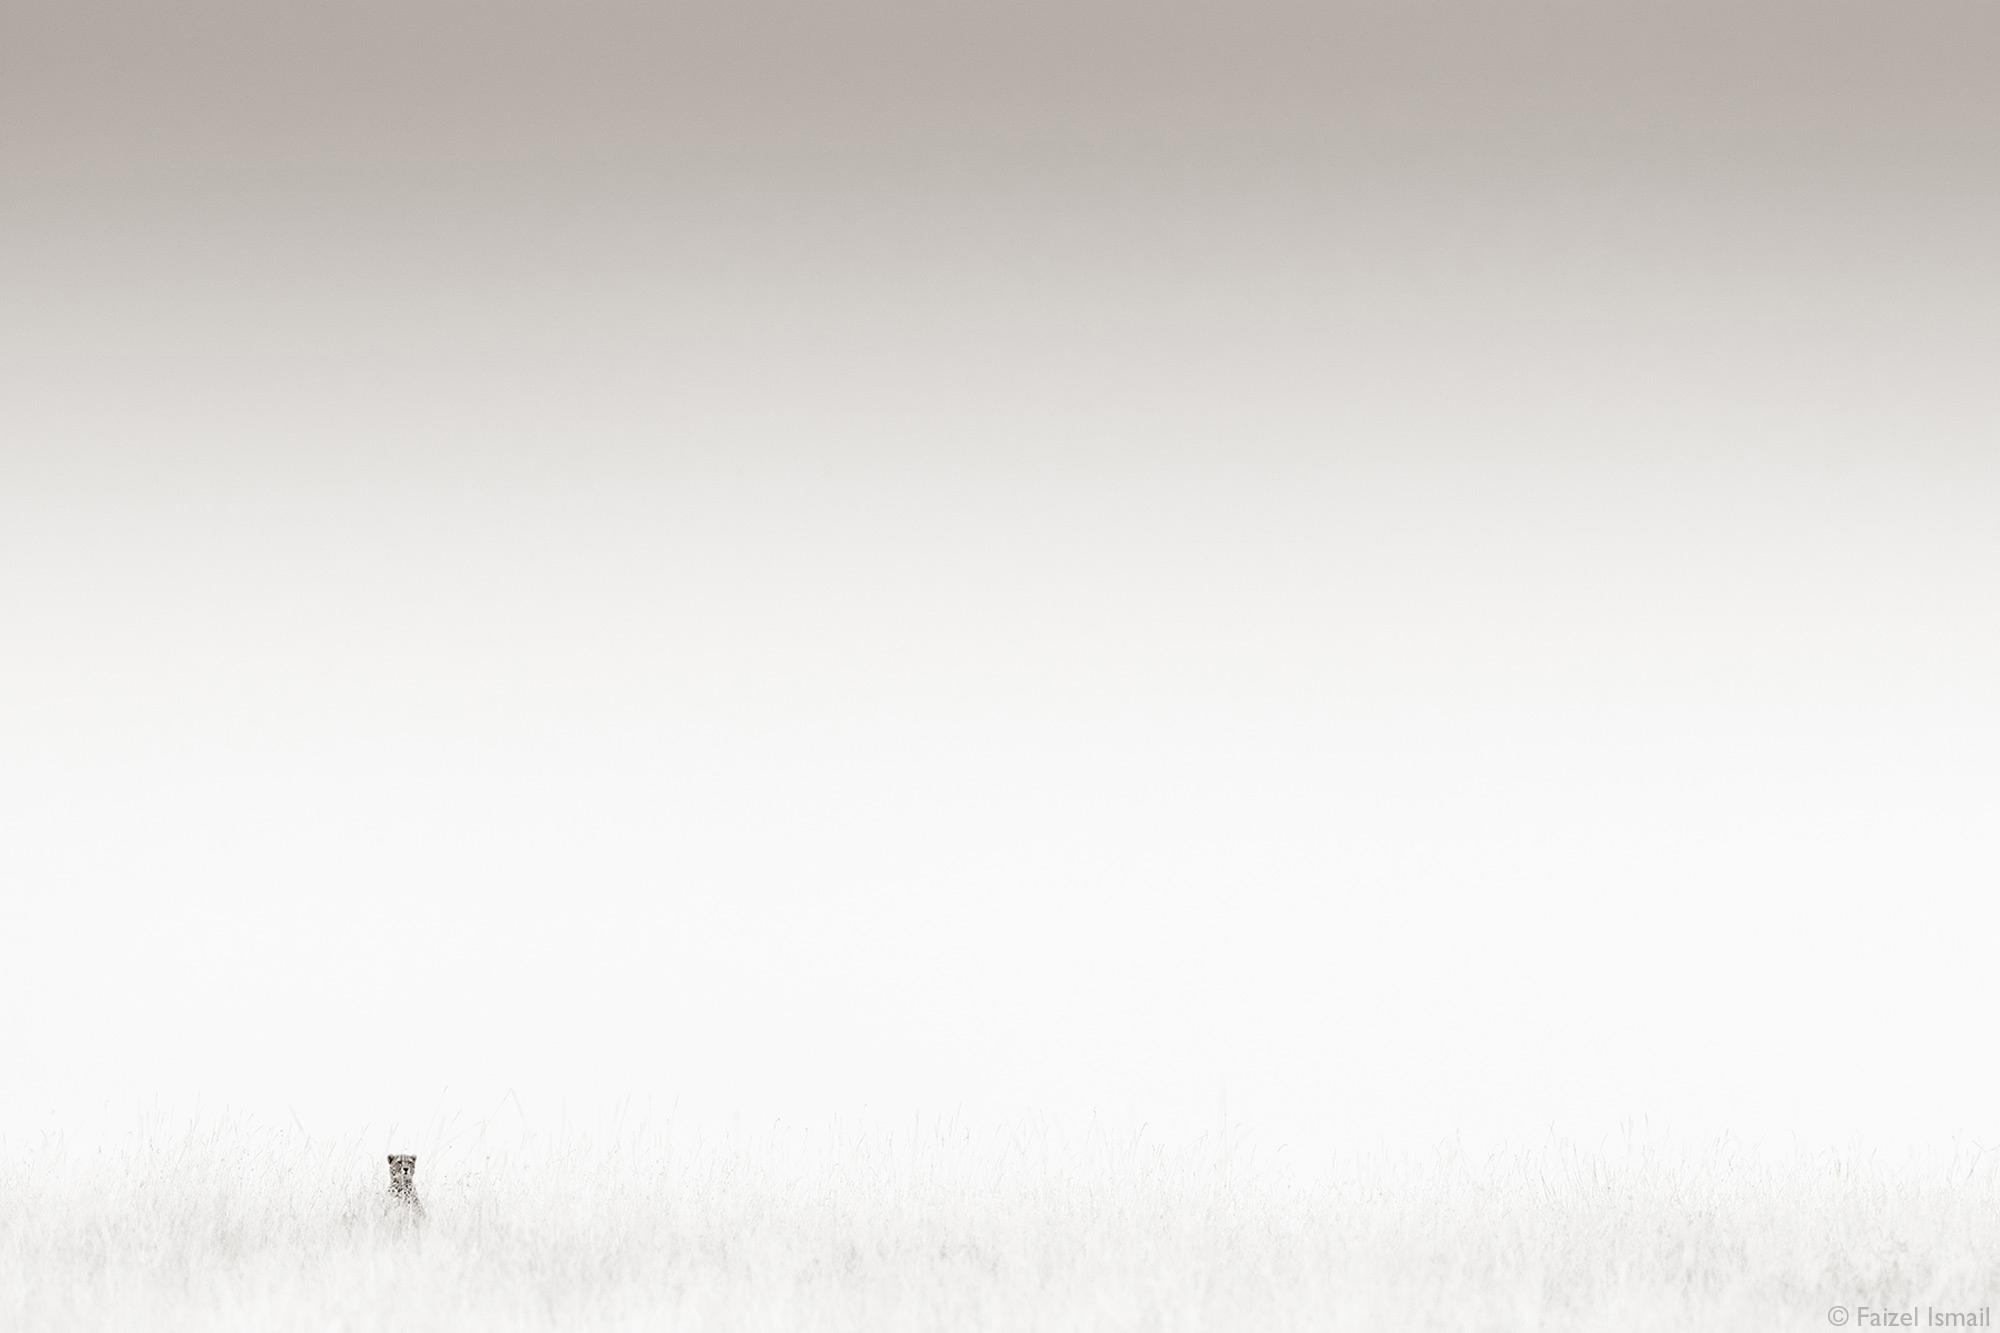 Single cheetah sitting in vast landscape of Maasai Mara, Kenya